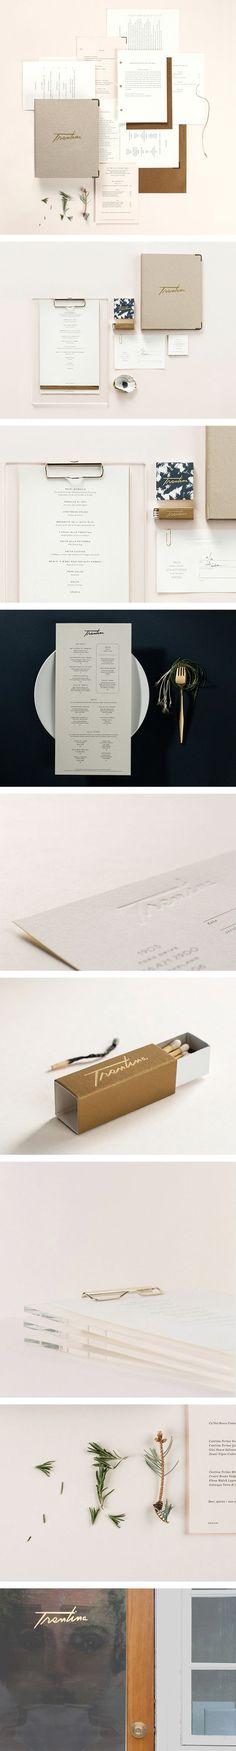 Trentina Restaurant Branding by Christine Wisnieski | Fivestar Branding – Design and Branding Agency & Inspiration Gallery